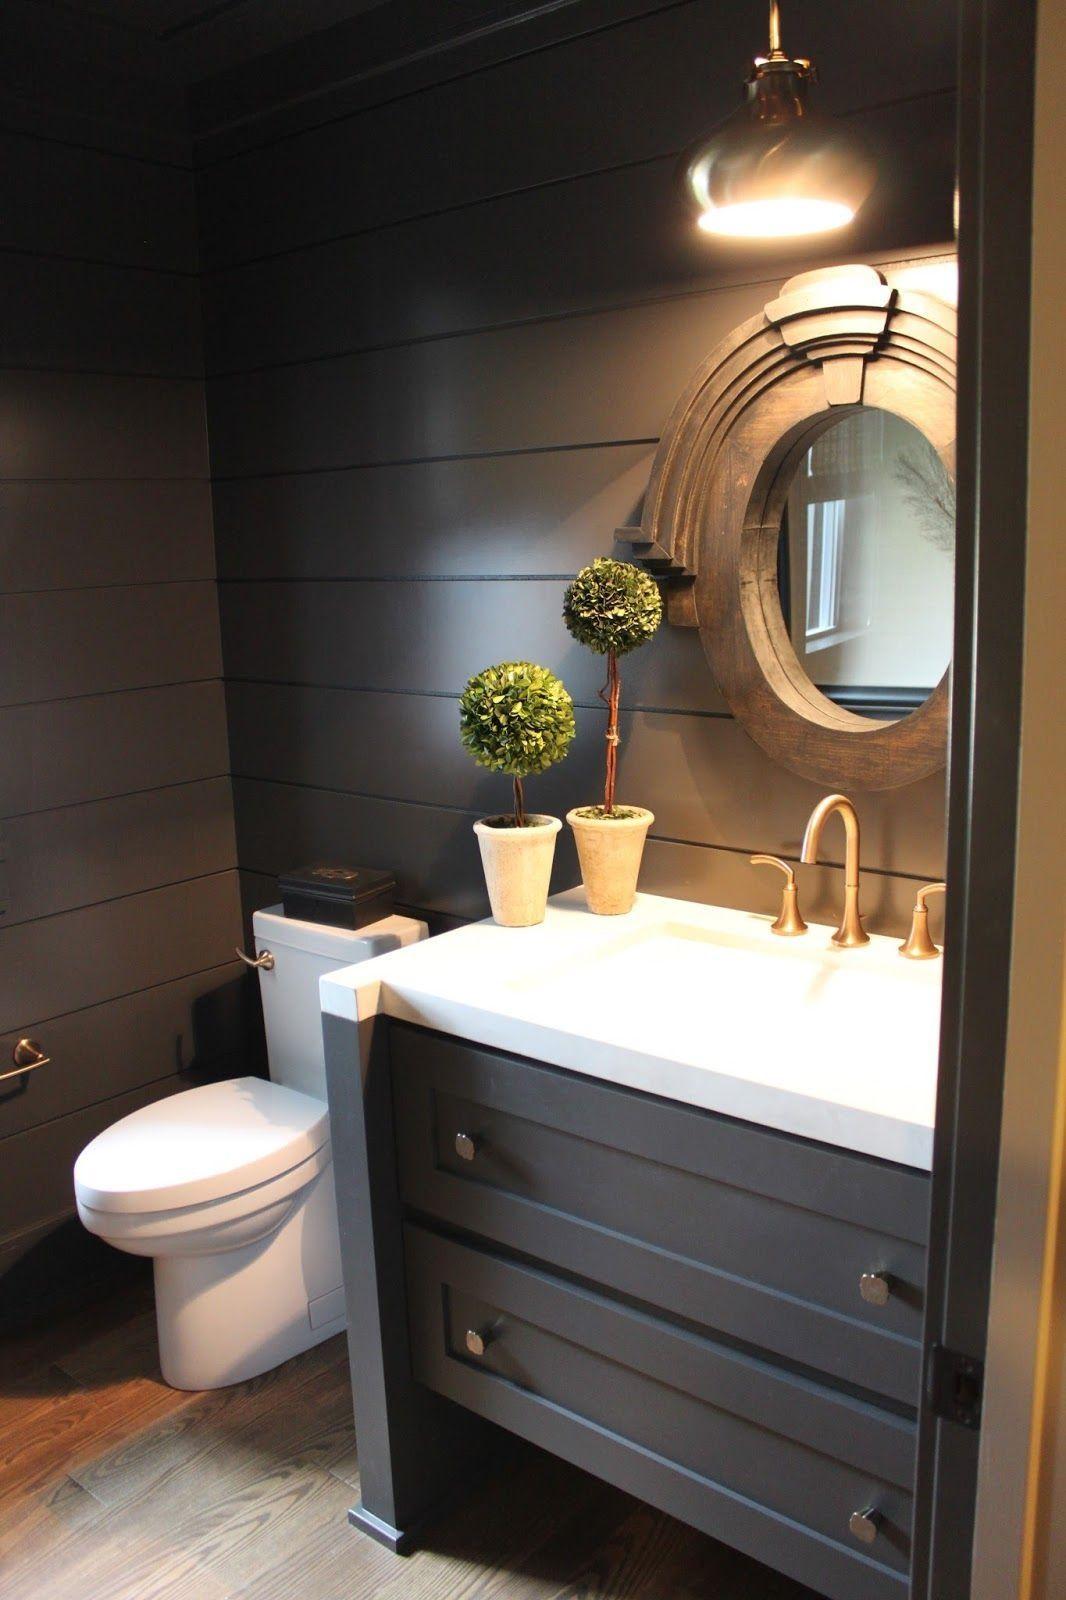 Log cabin half bath bathroom details pinterest for Log cabins with bathrooms